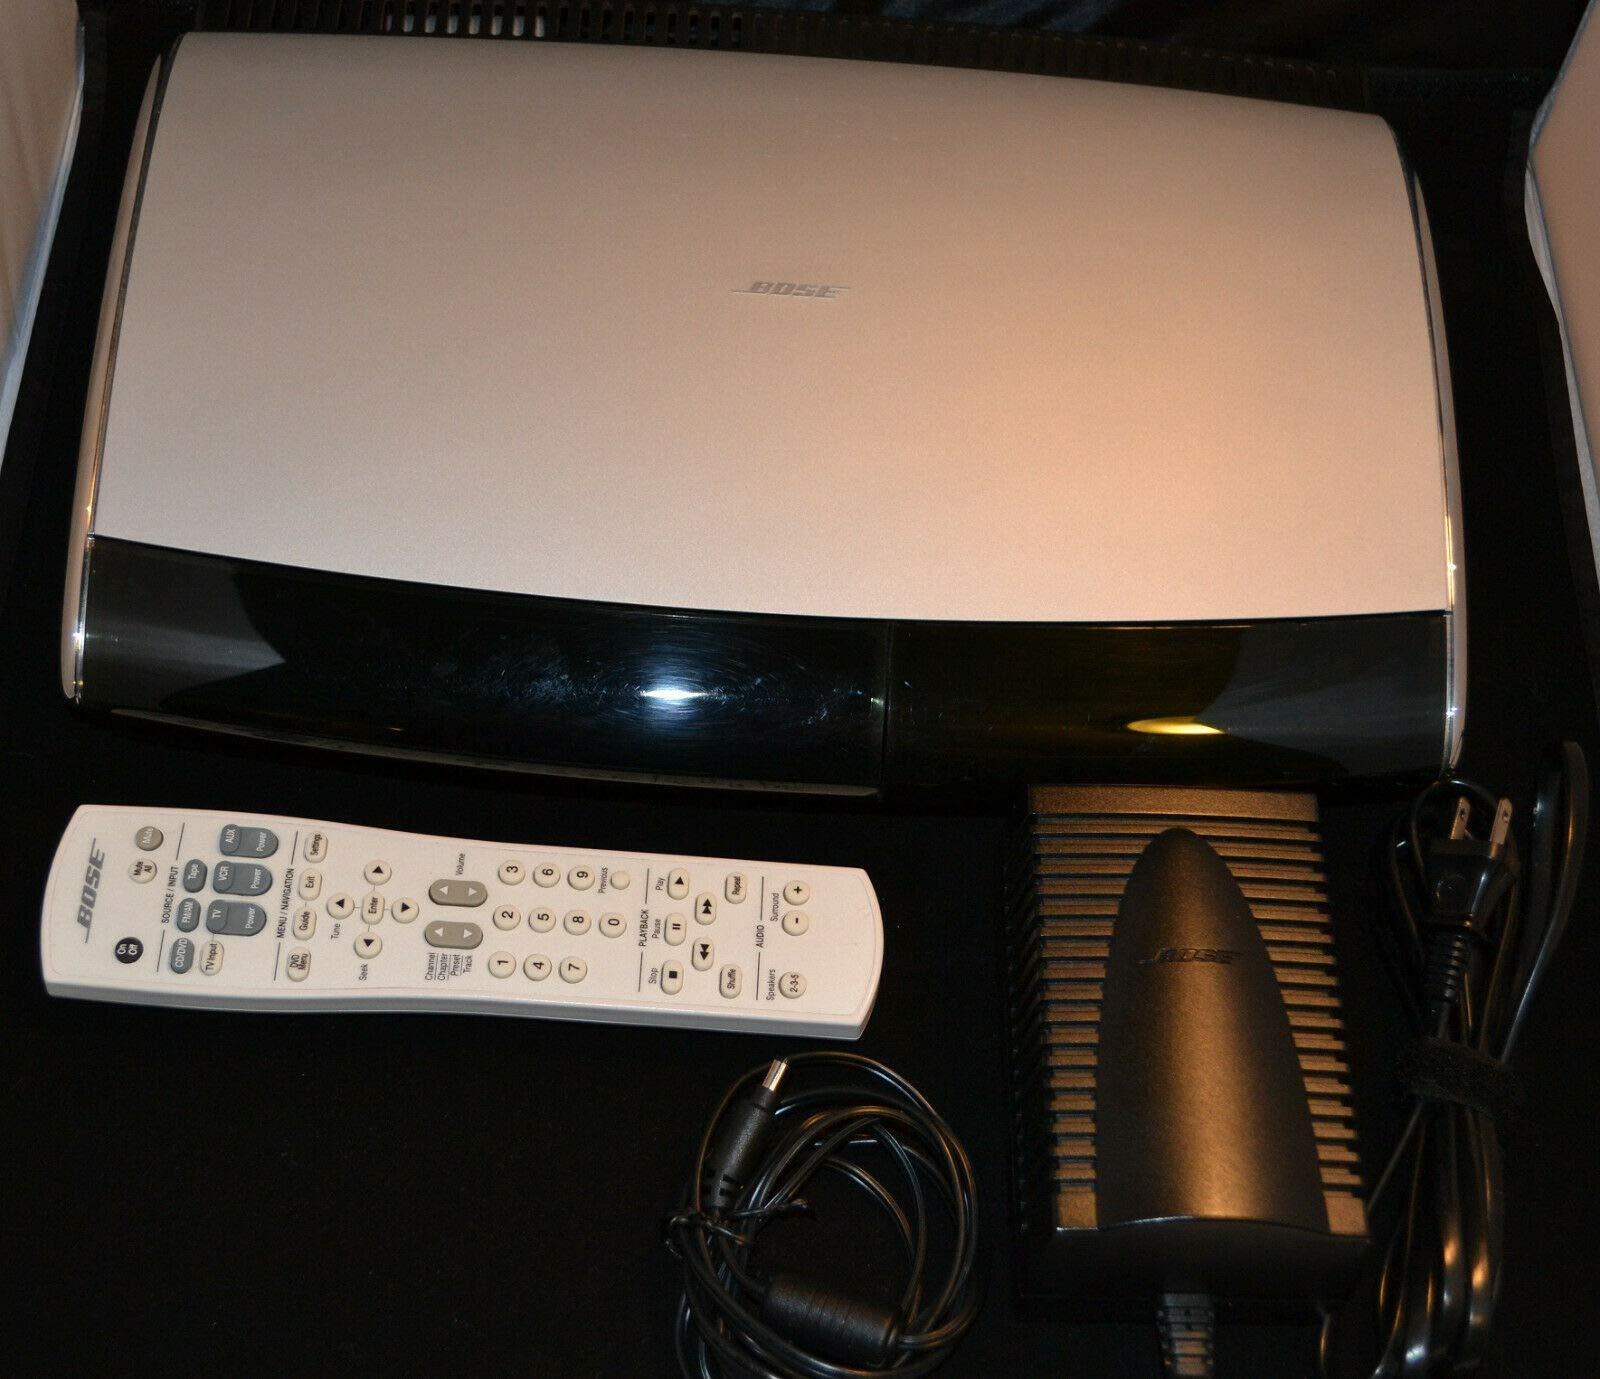 Bose AV 28 Media Center